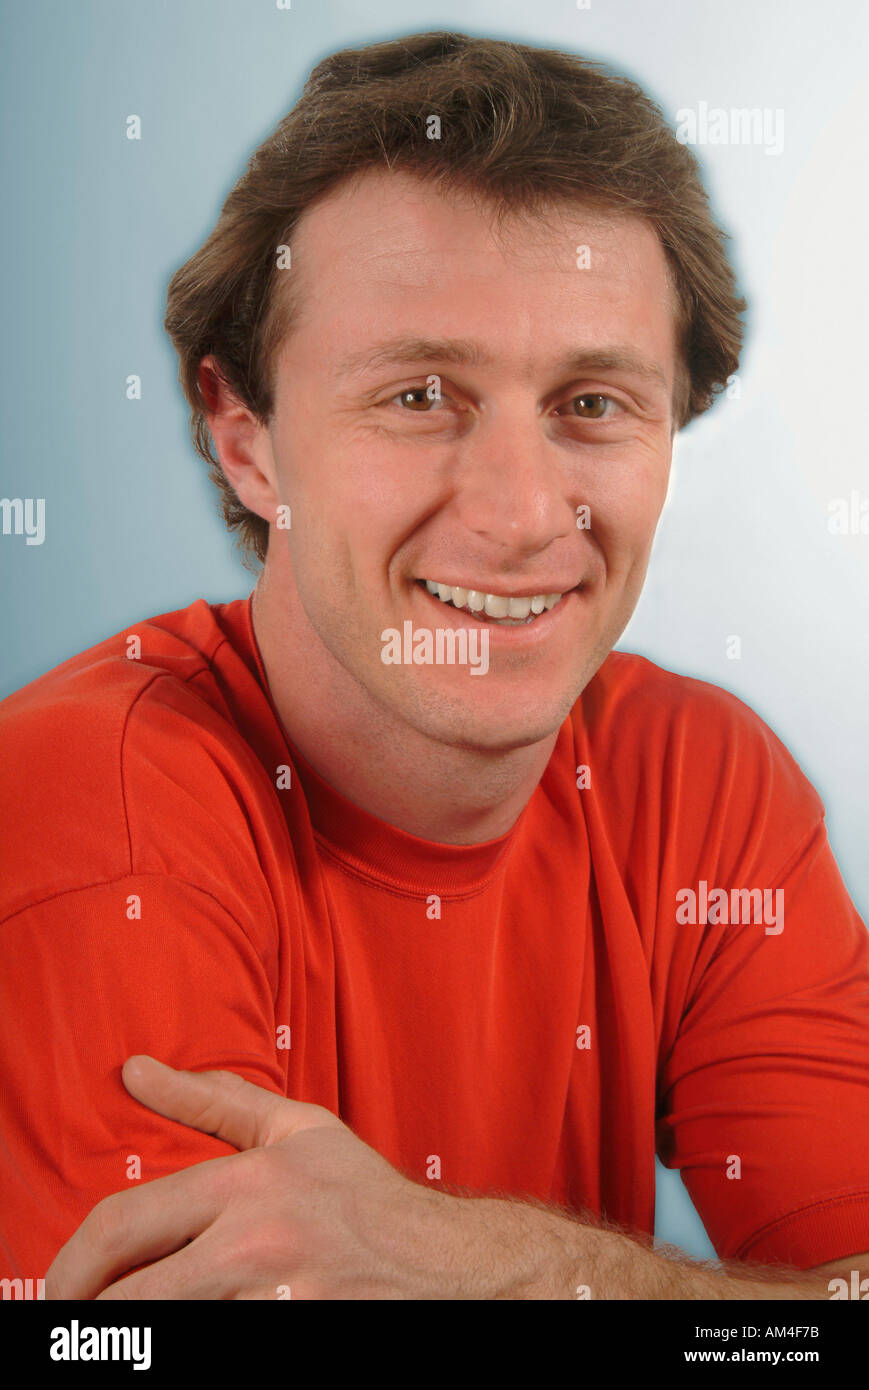 A happy 20-something man - Stock Image